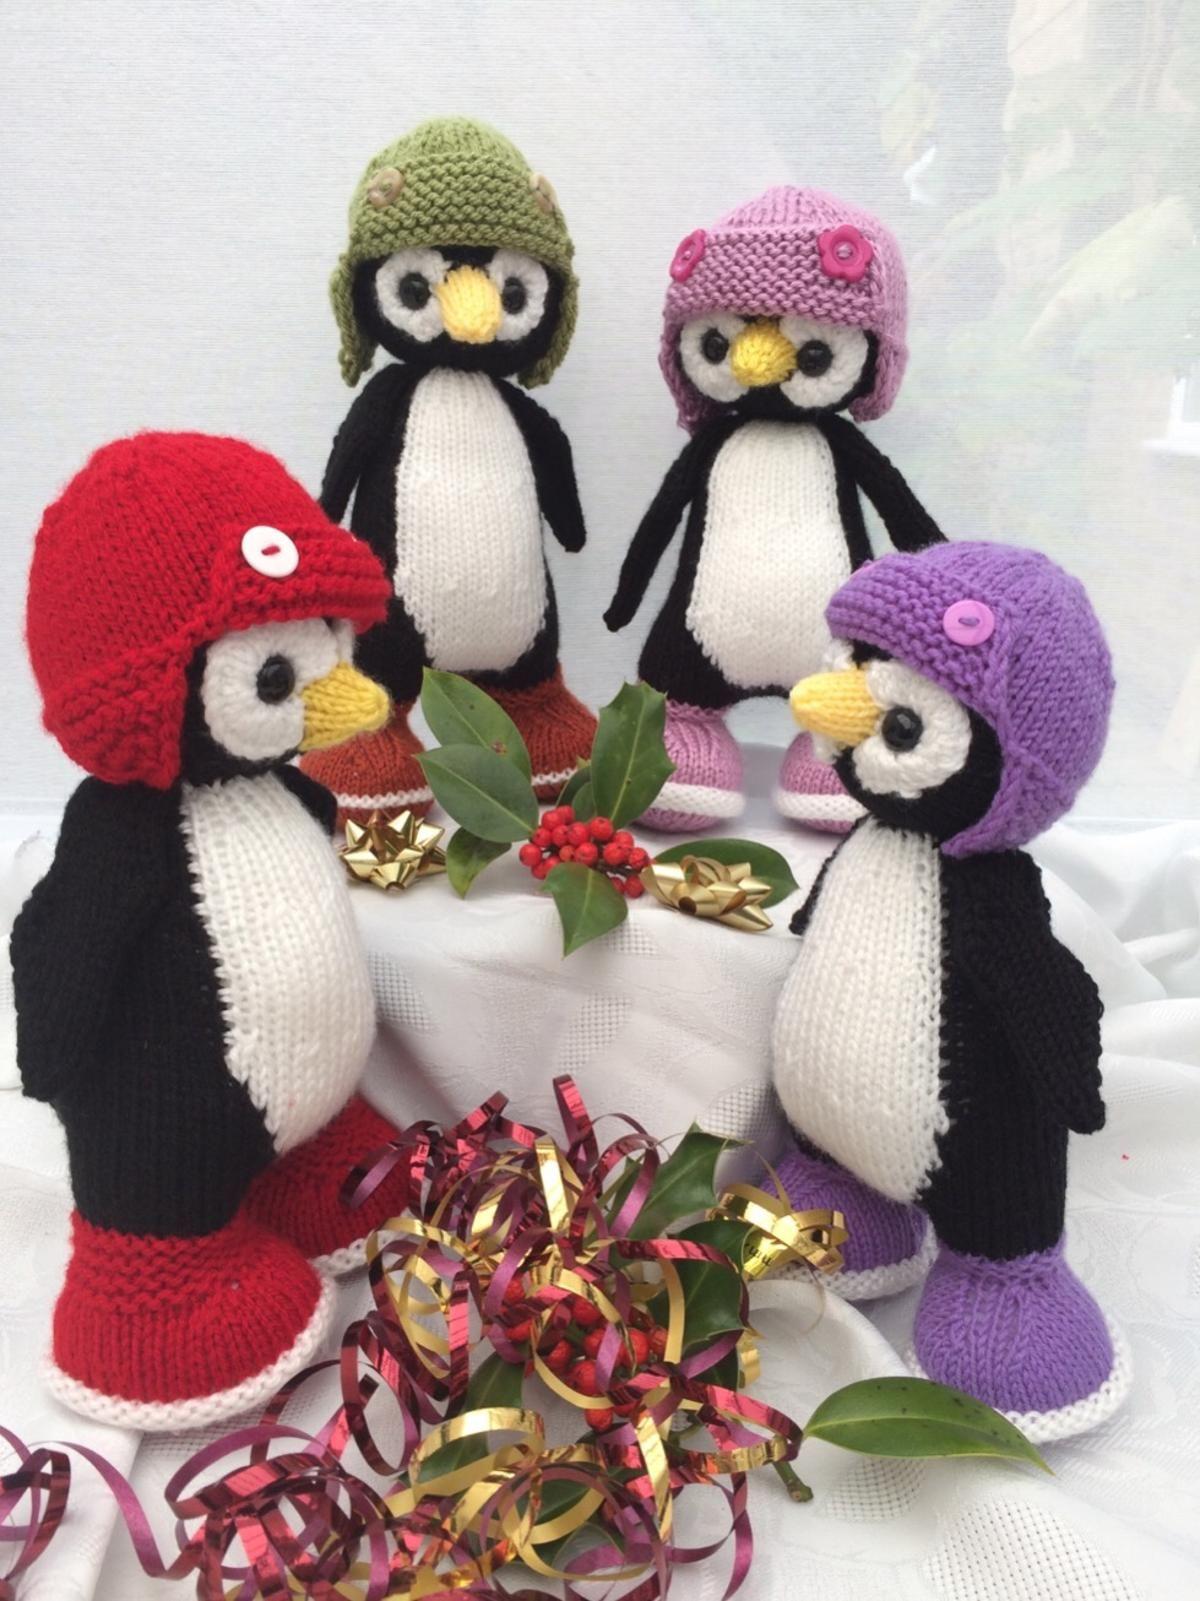 Perty the penguin penguins knitting patterns and patterns perty the penguin the penguinsknitting patternsyarn bankloansurffo Images